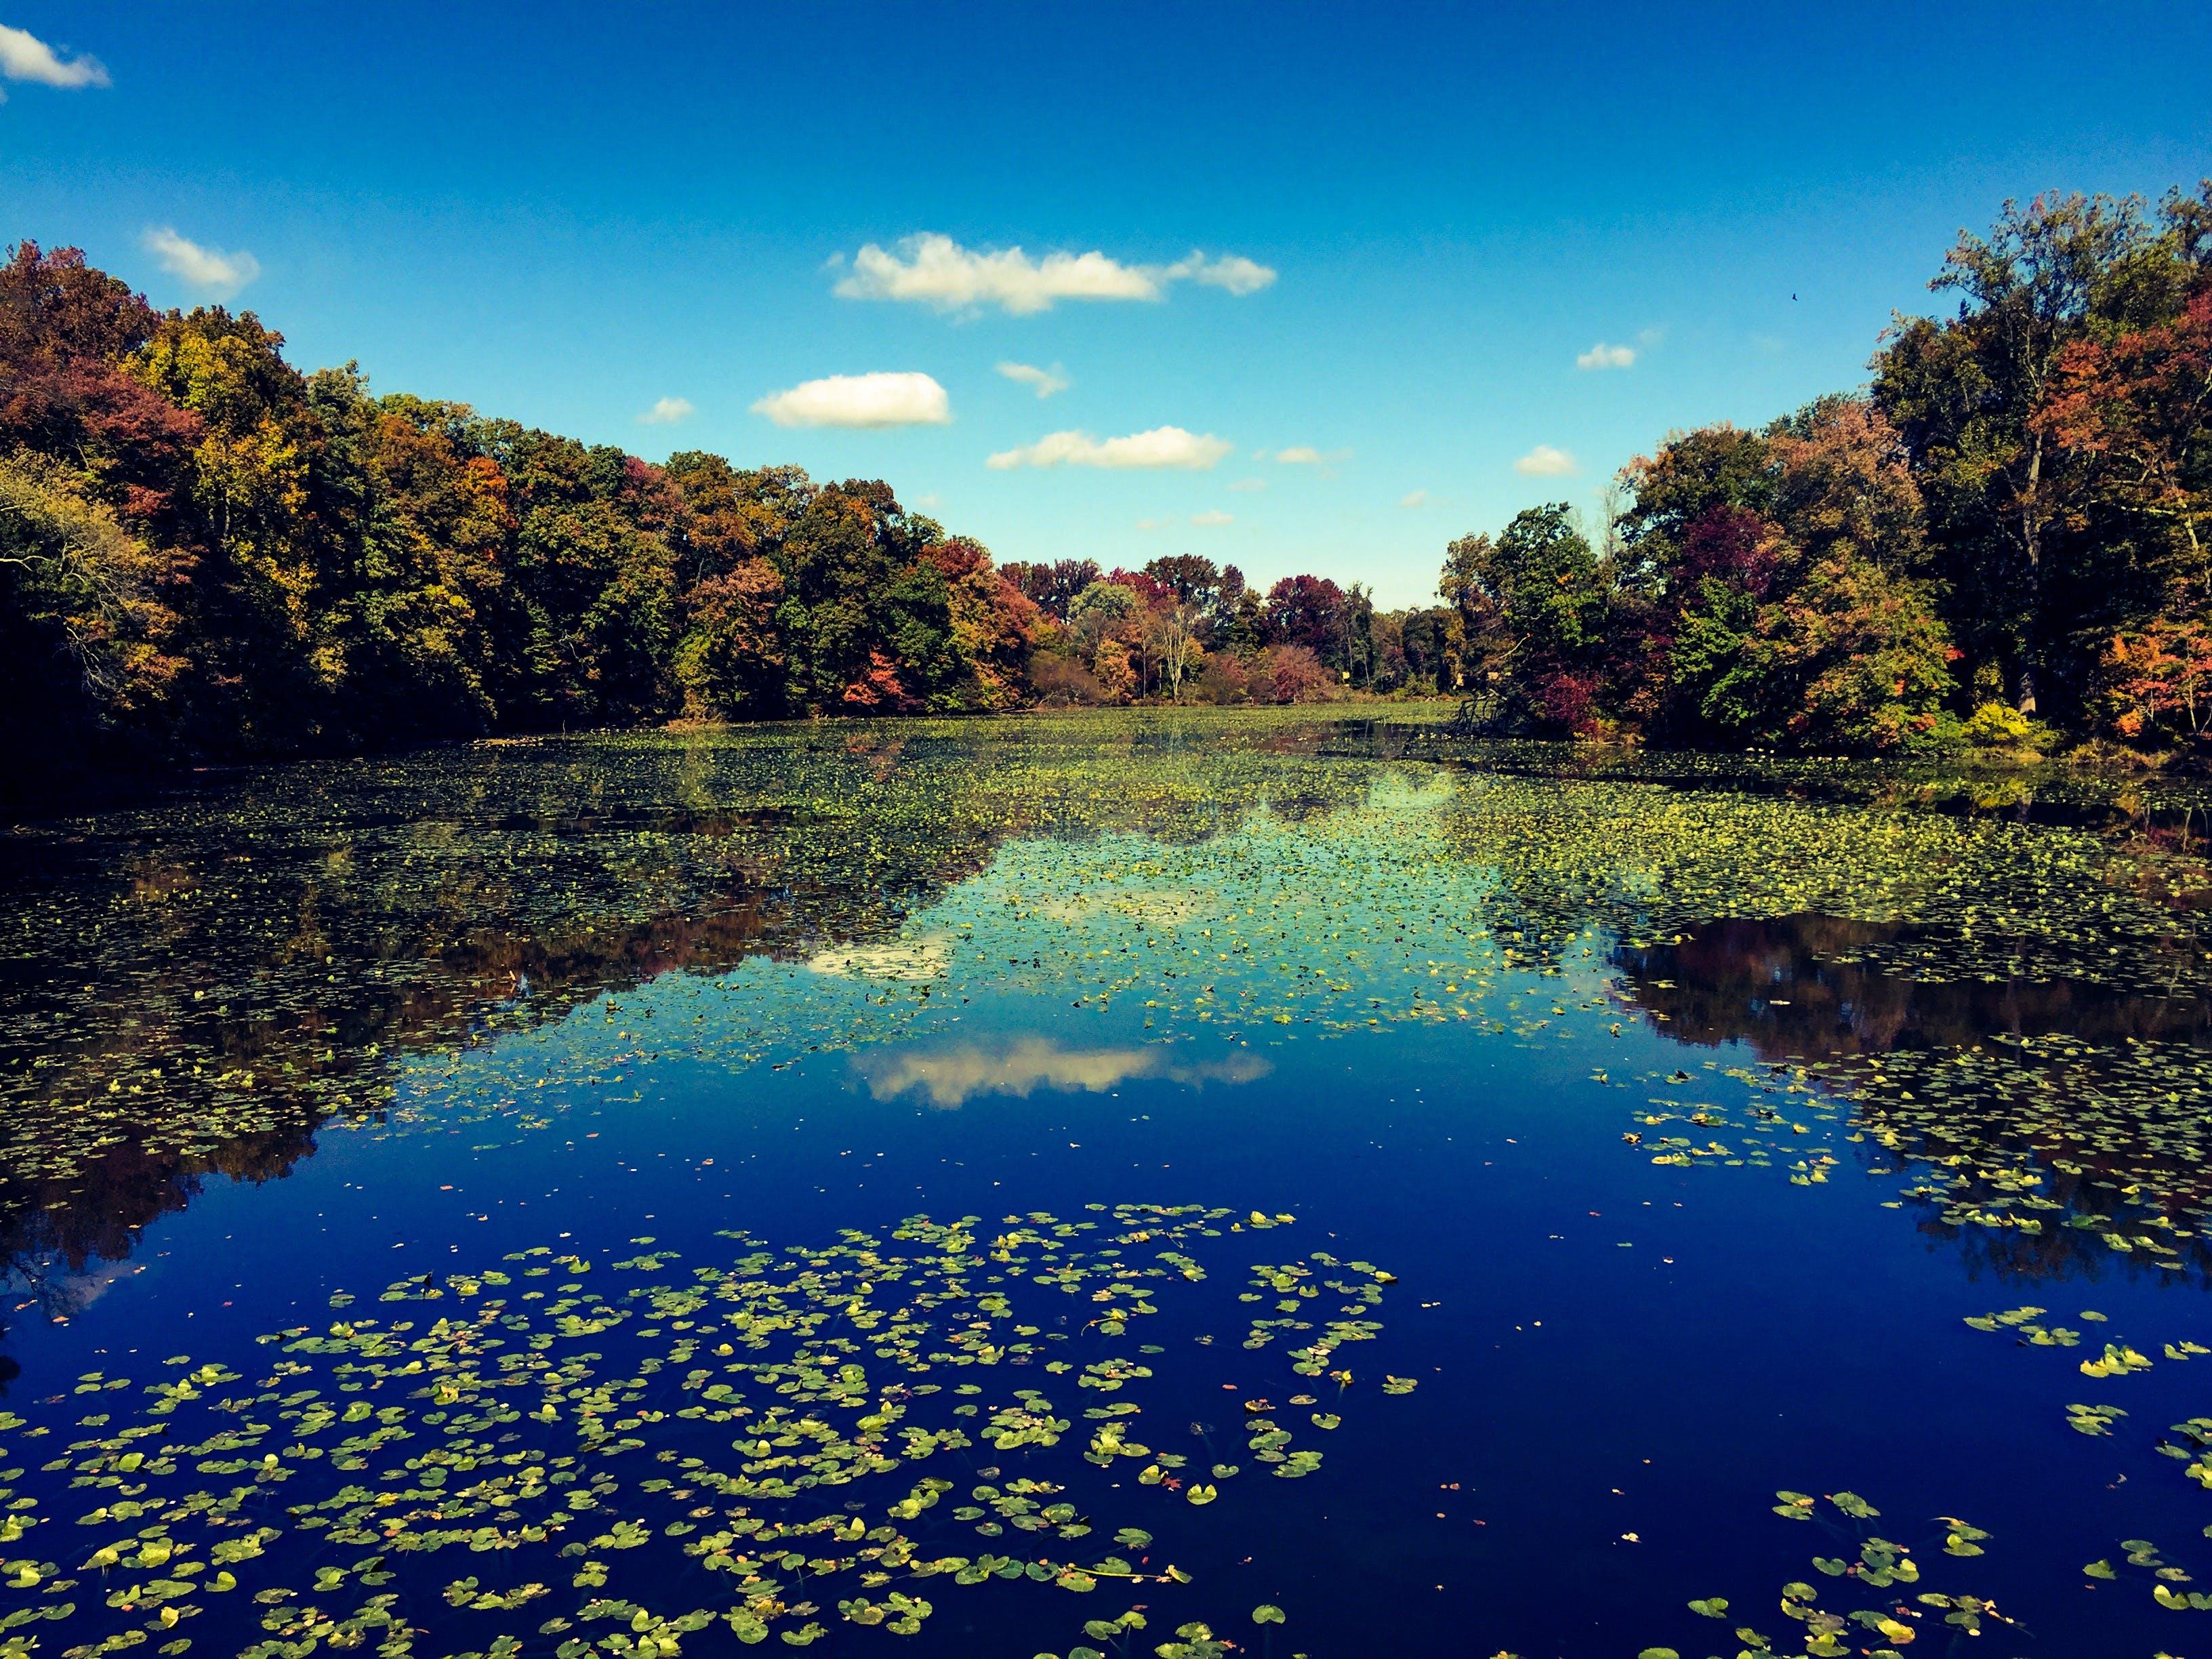 Kostenloses Stock Foto zu bäume, landschaft, natur, reflektierung